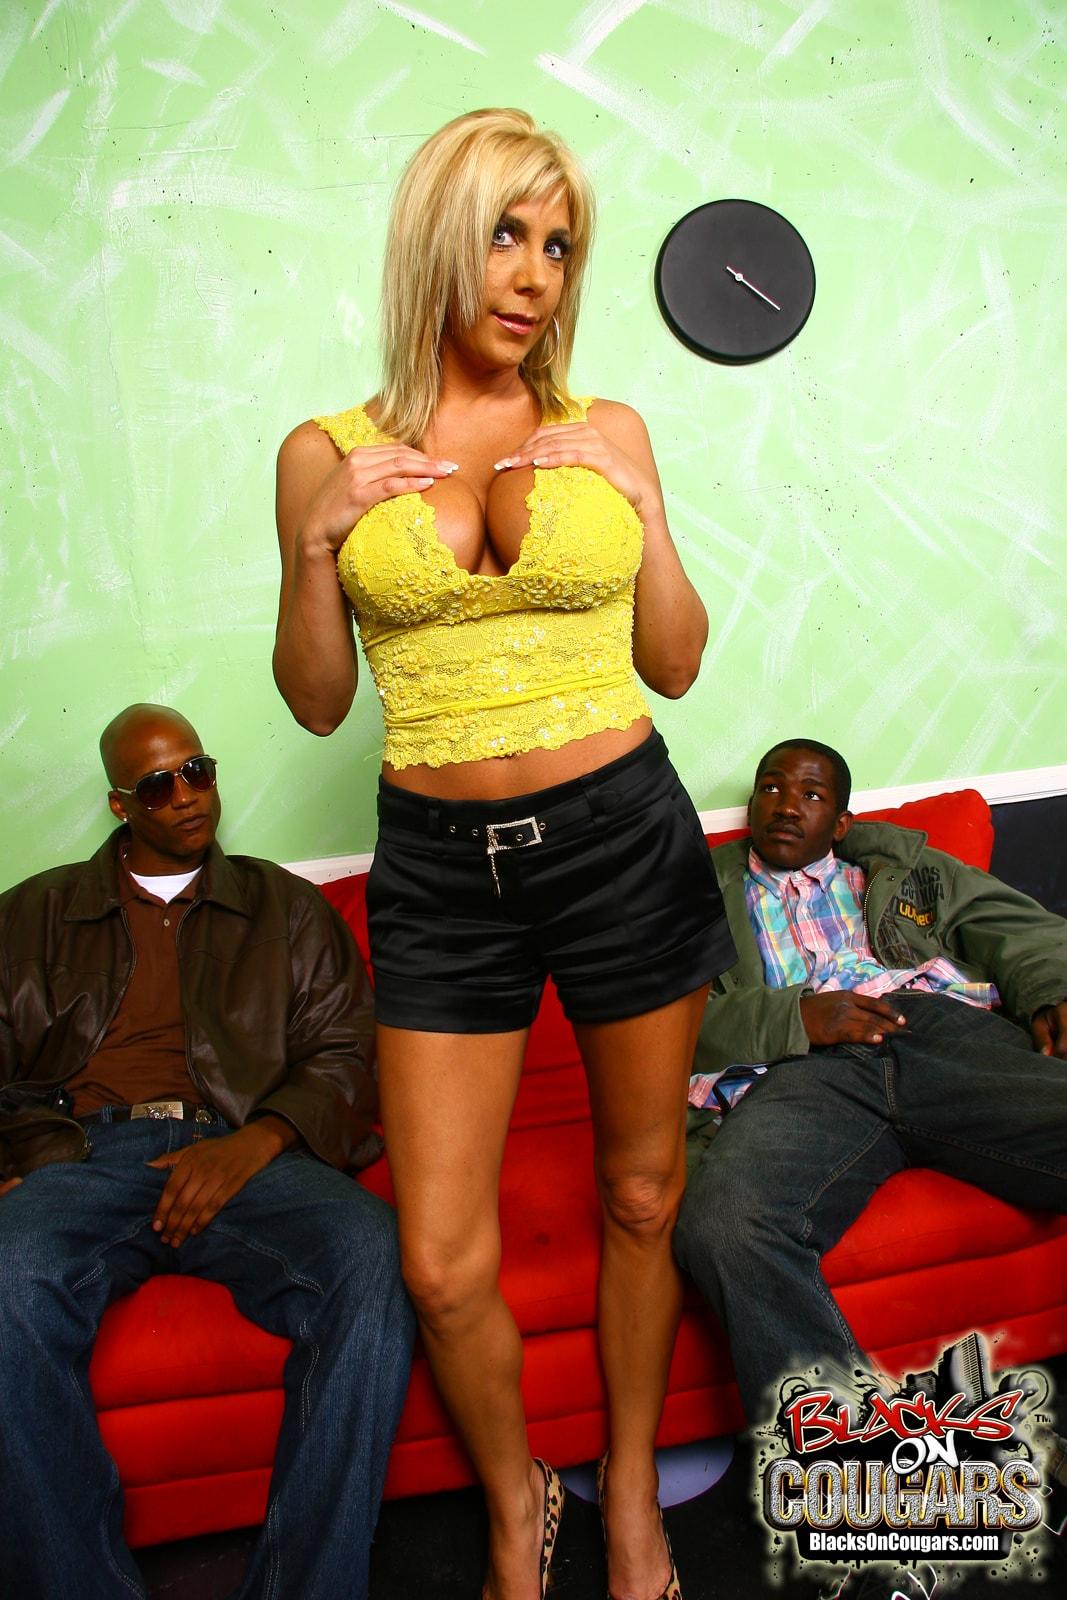 Dogfart '- Blacks On Cougars' starring Misty Vonage (Photo 8)